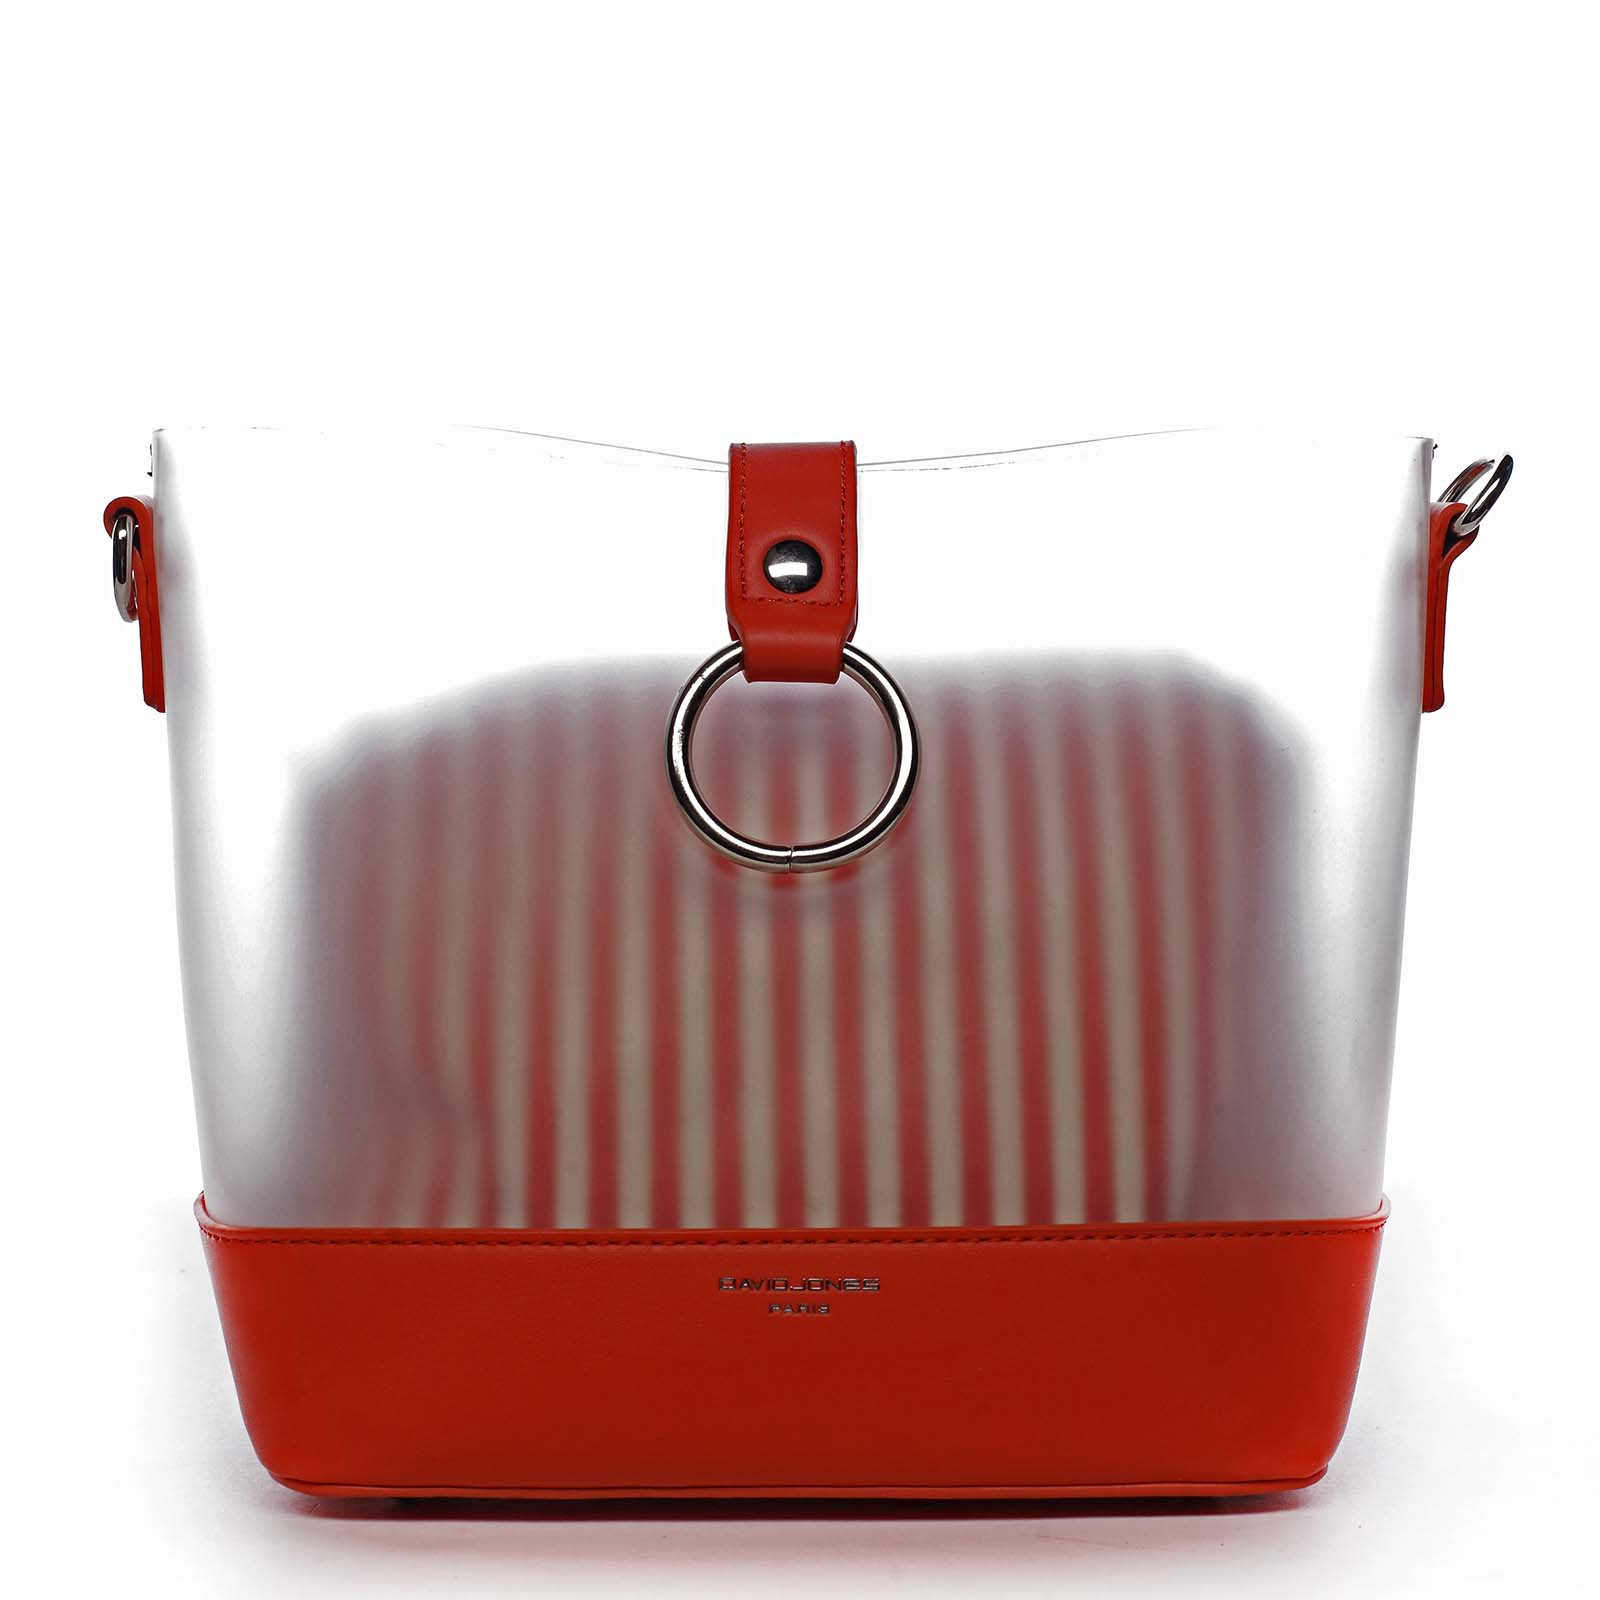 Originálna dámska crossbody kabelka červená - David Jones Crazy červená